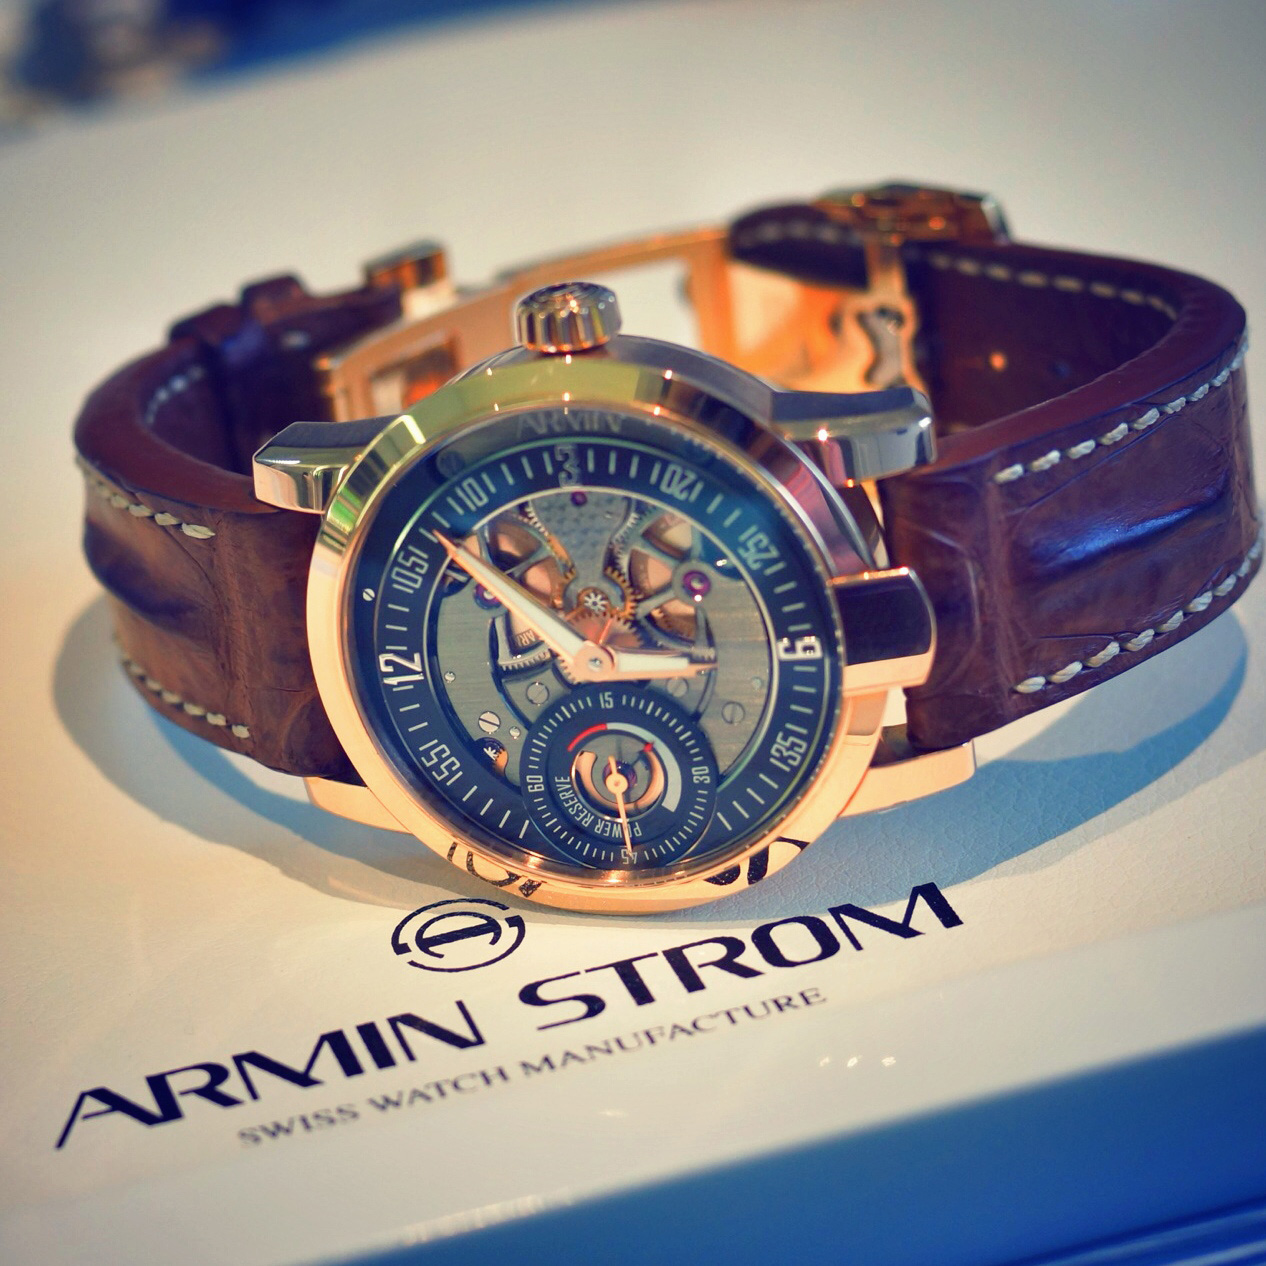 Armin Strom One Week